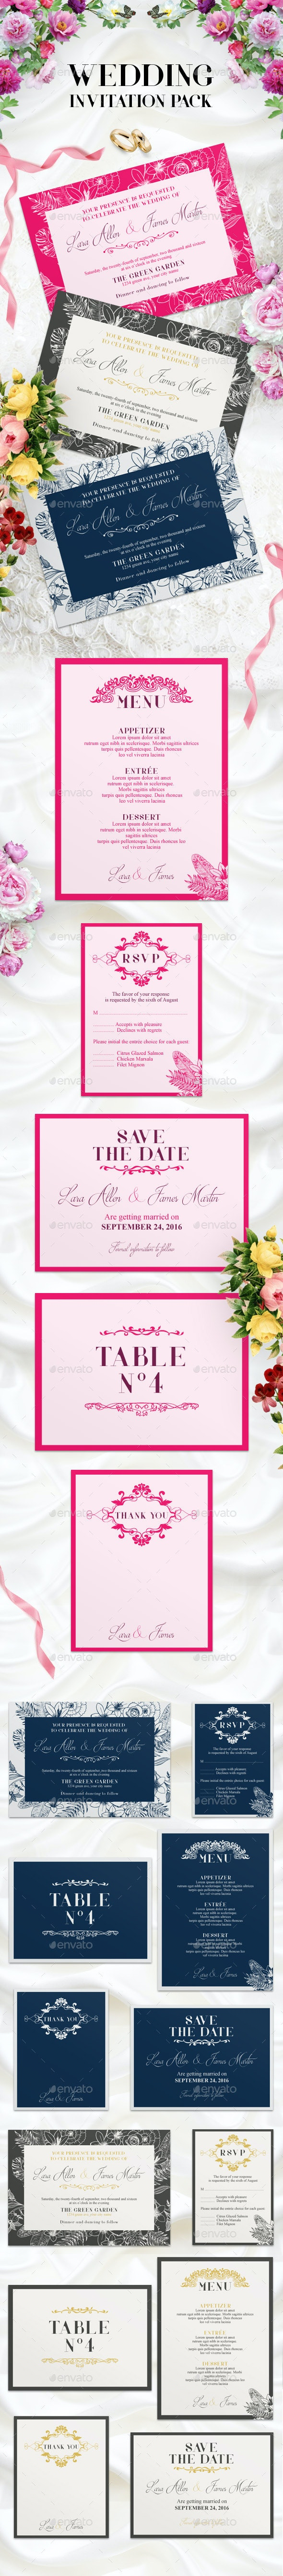 Wedding Invitation Pack - Weddings Cards & Invites